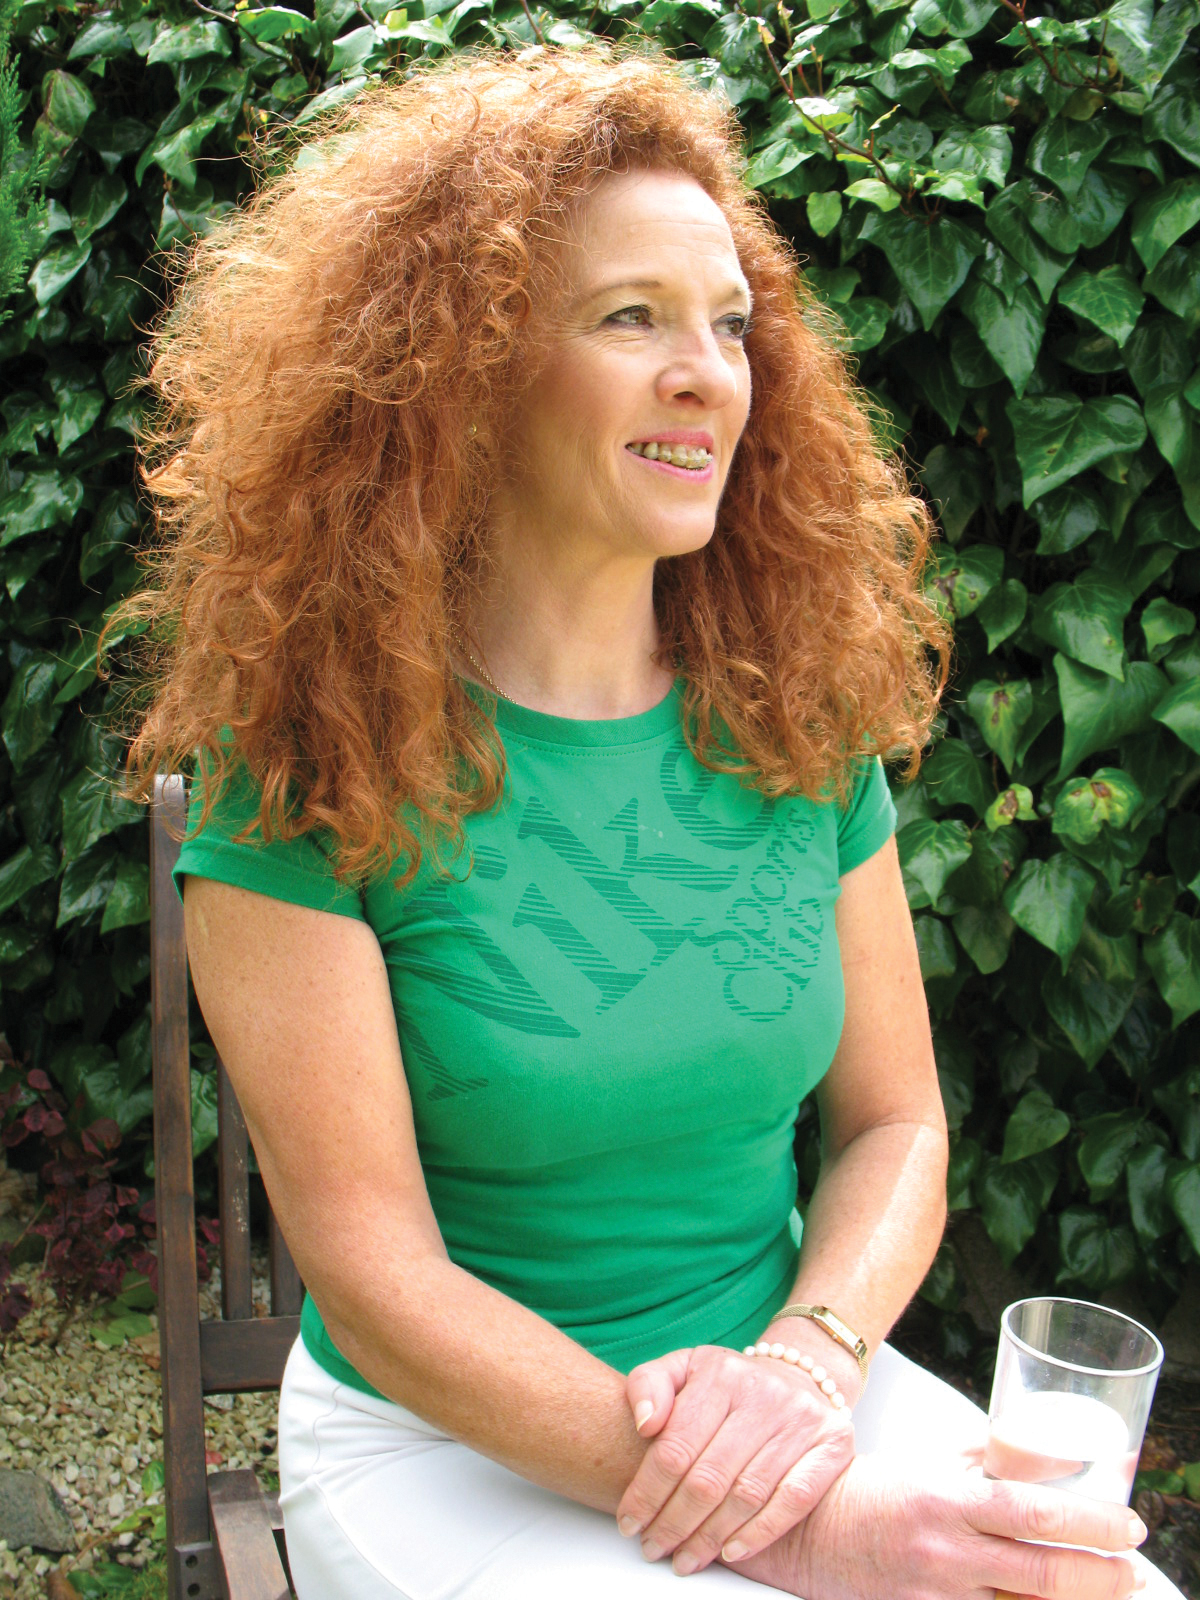 Susan Boland, nutritional therapist - Specialties: Bone health, Arthritis, Menopause, Joint Pain